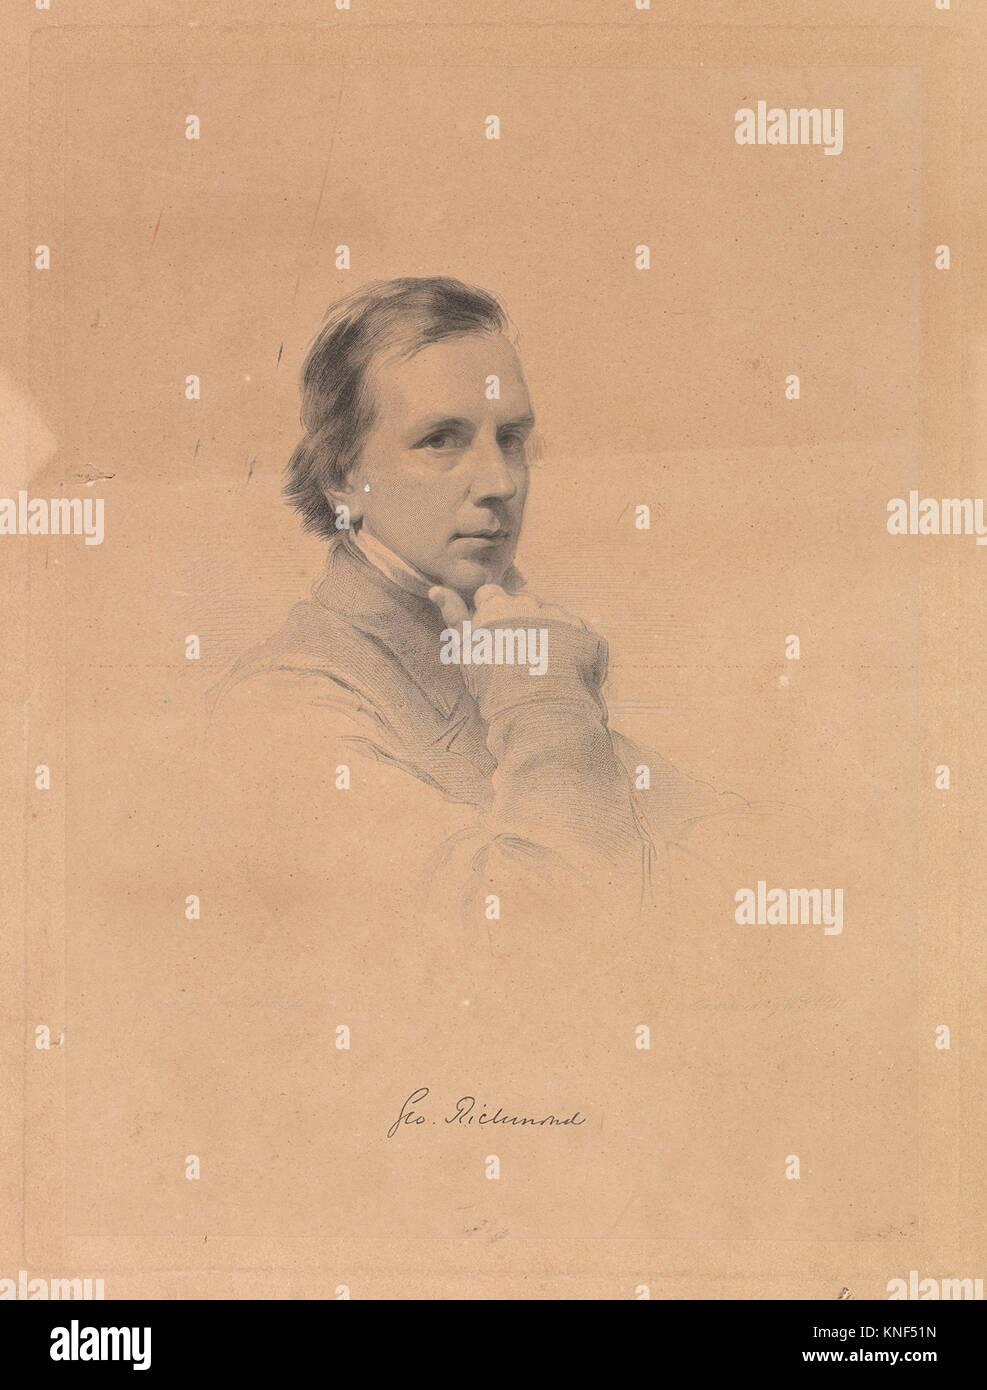 George Richmond - Self-portrait. Artist: After George Richmond (British, Brompton 1809-1896 London); Engraver: William - Stock Image